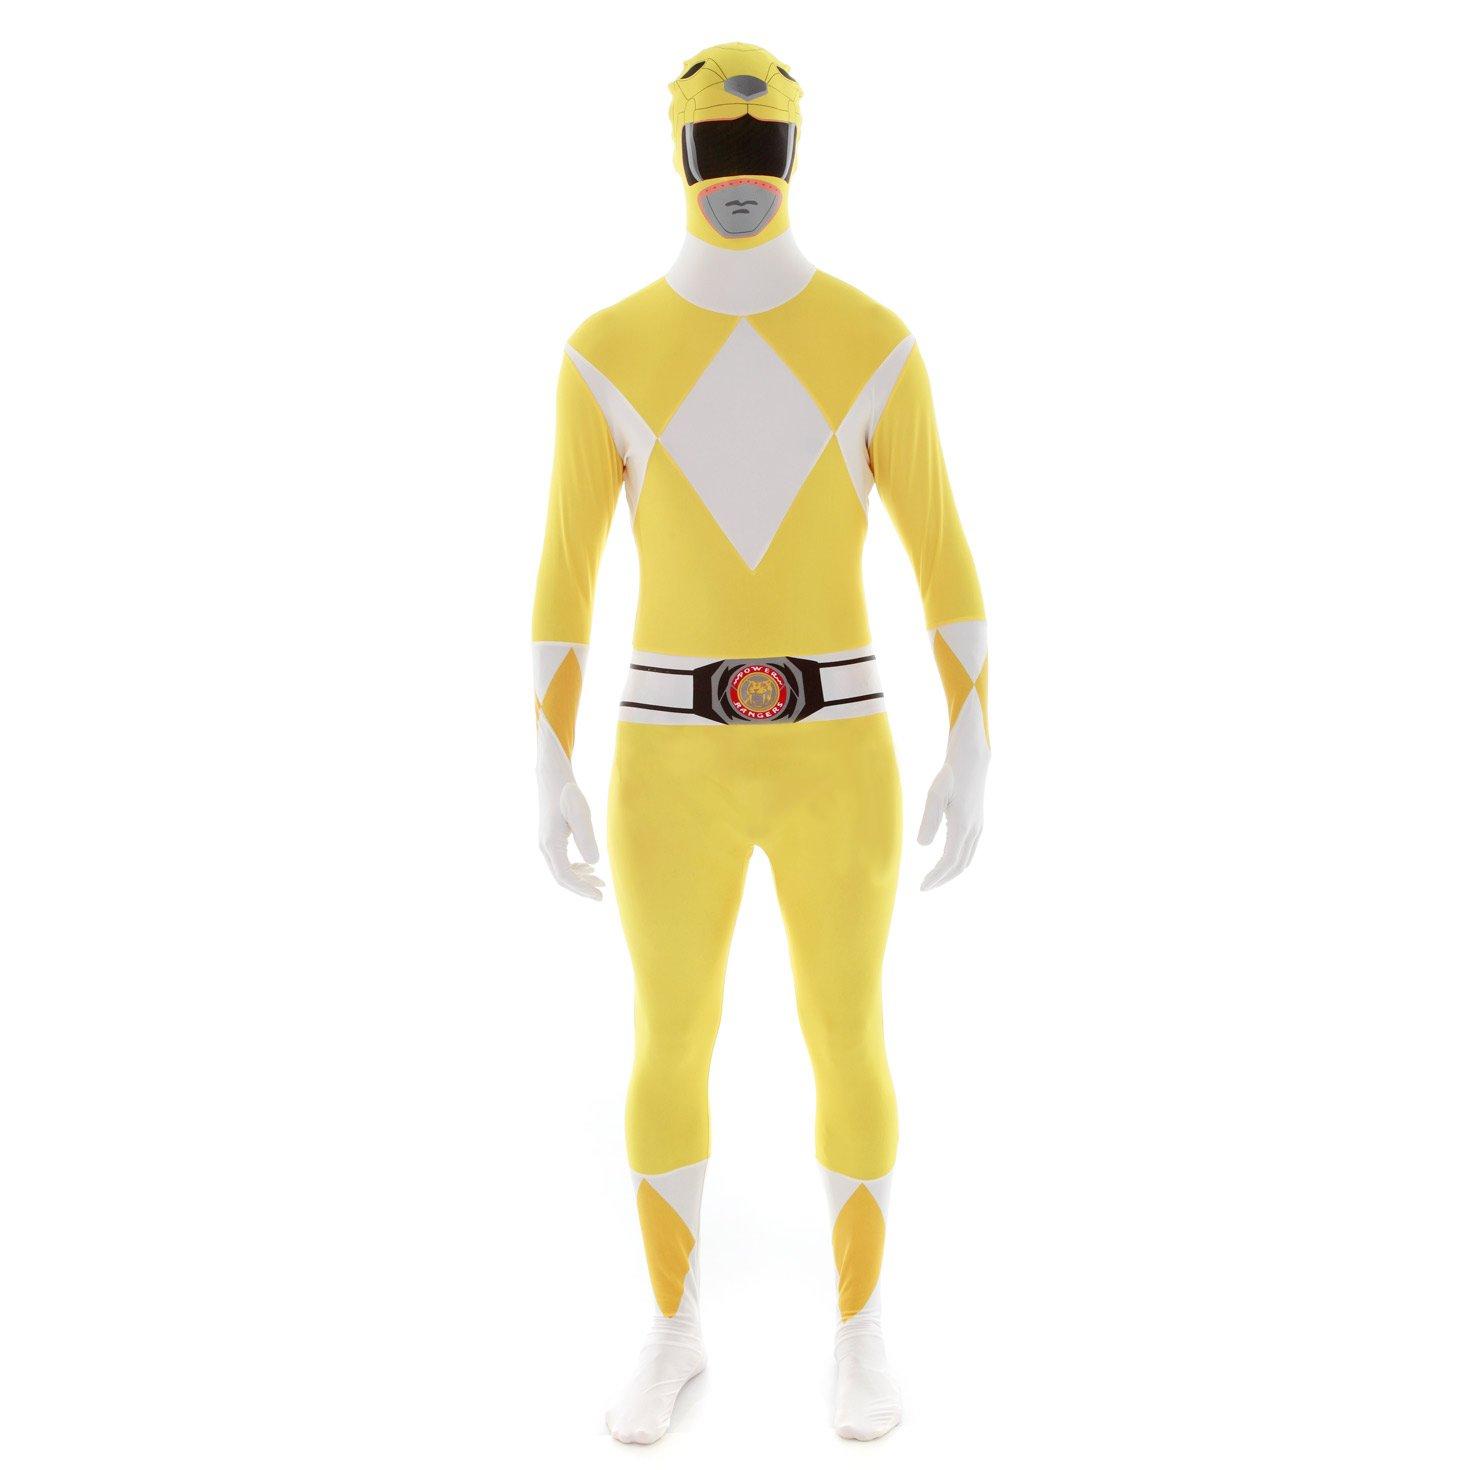 Morphsuits Official Power Ranger Costume,Yellow,Medium 5'-5'4'' (152cm - 163cm)